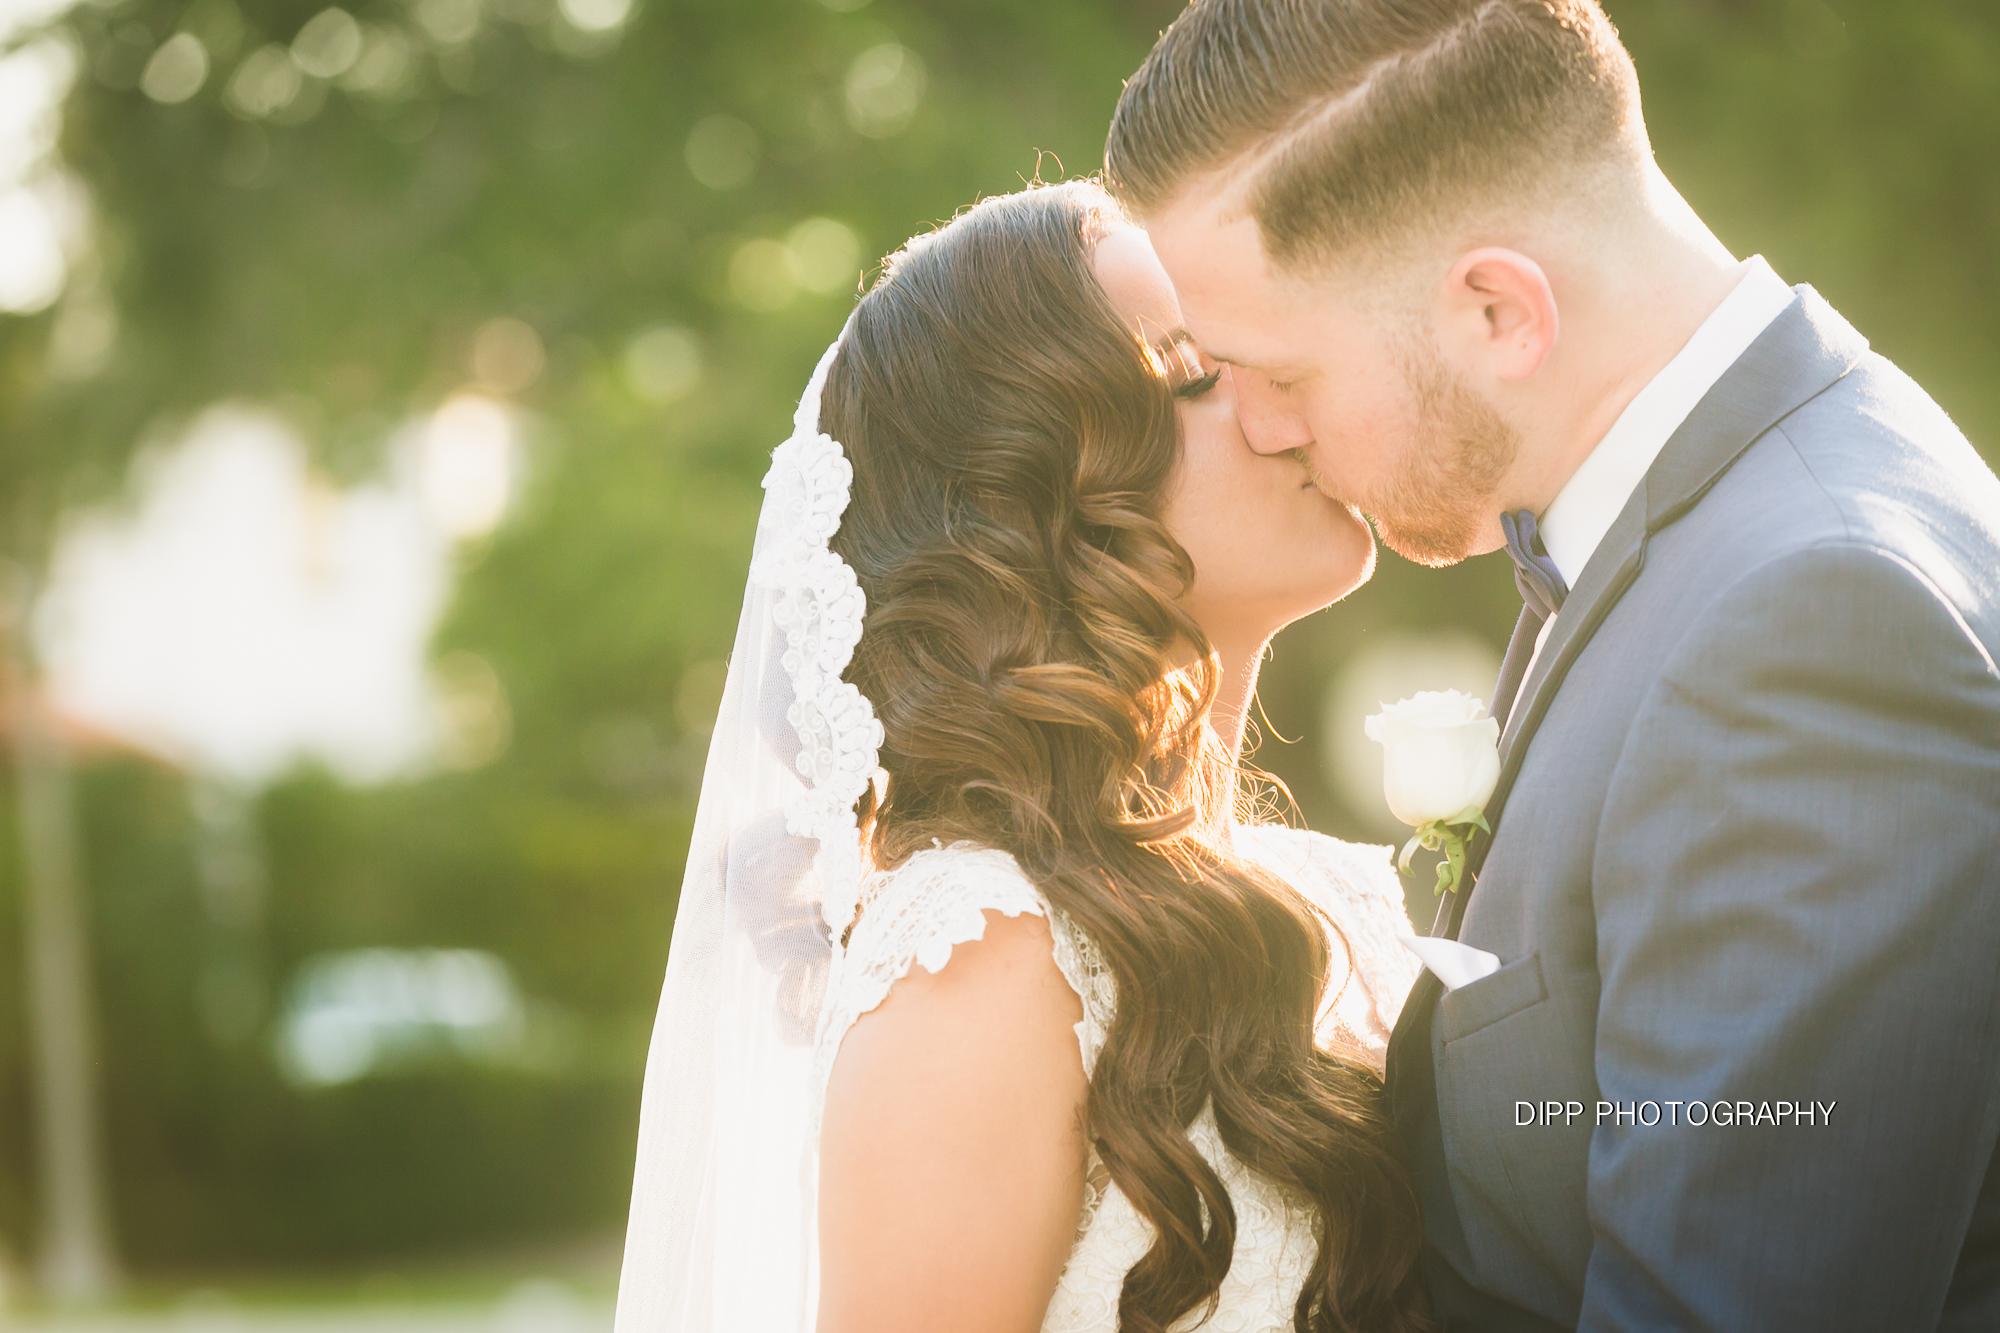 Dipp_2016 EDITED Melissa & Avilio Wedding-316